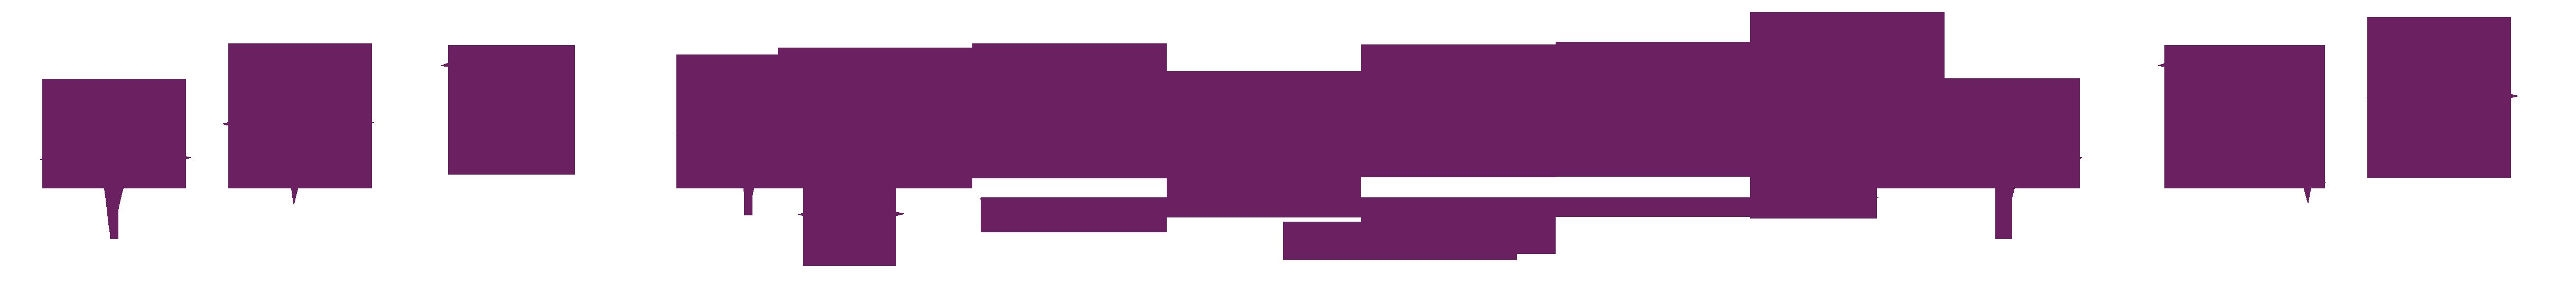 Sybele Shop